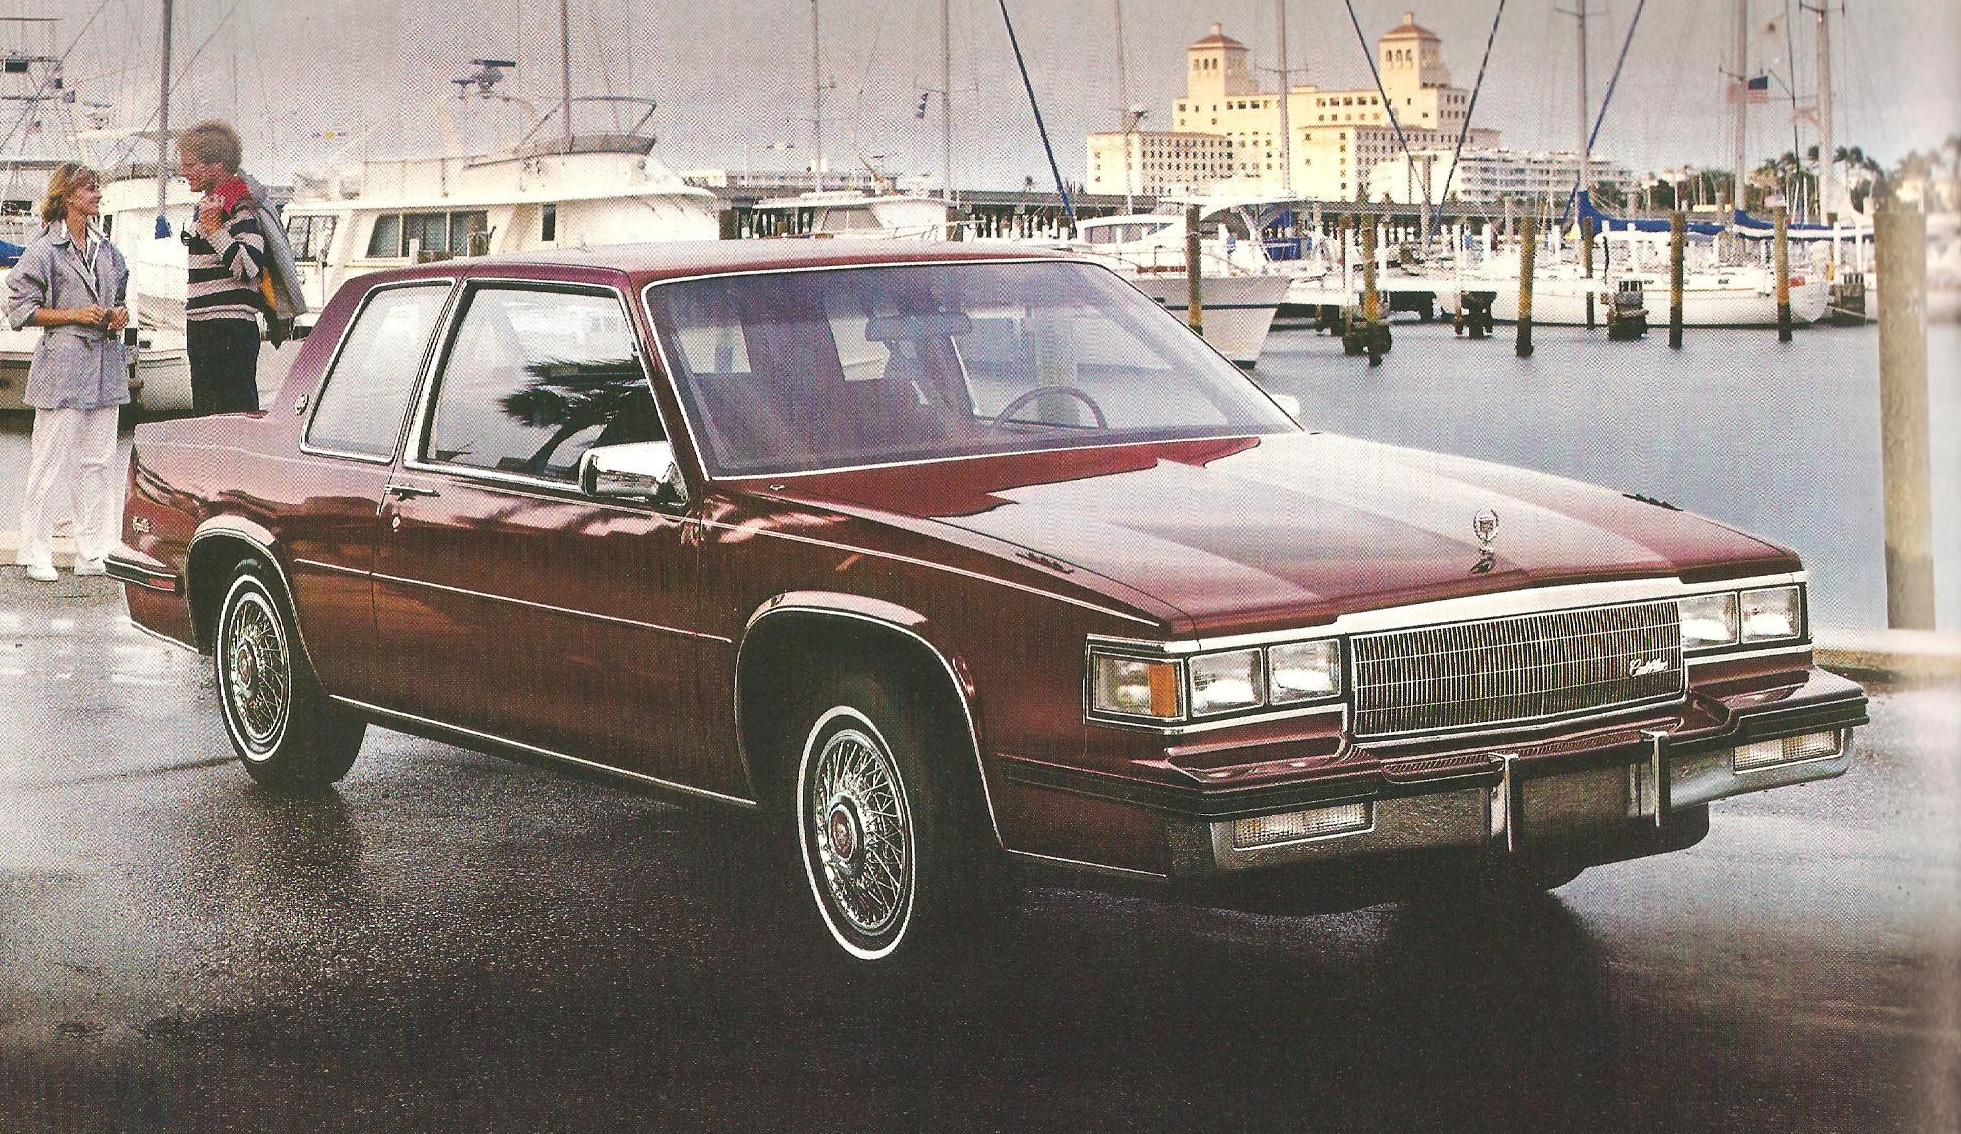 This is a 1985 Coupe de Ville. Not so impressive, eh?